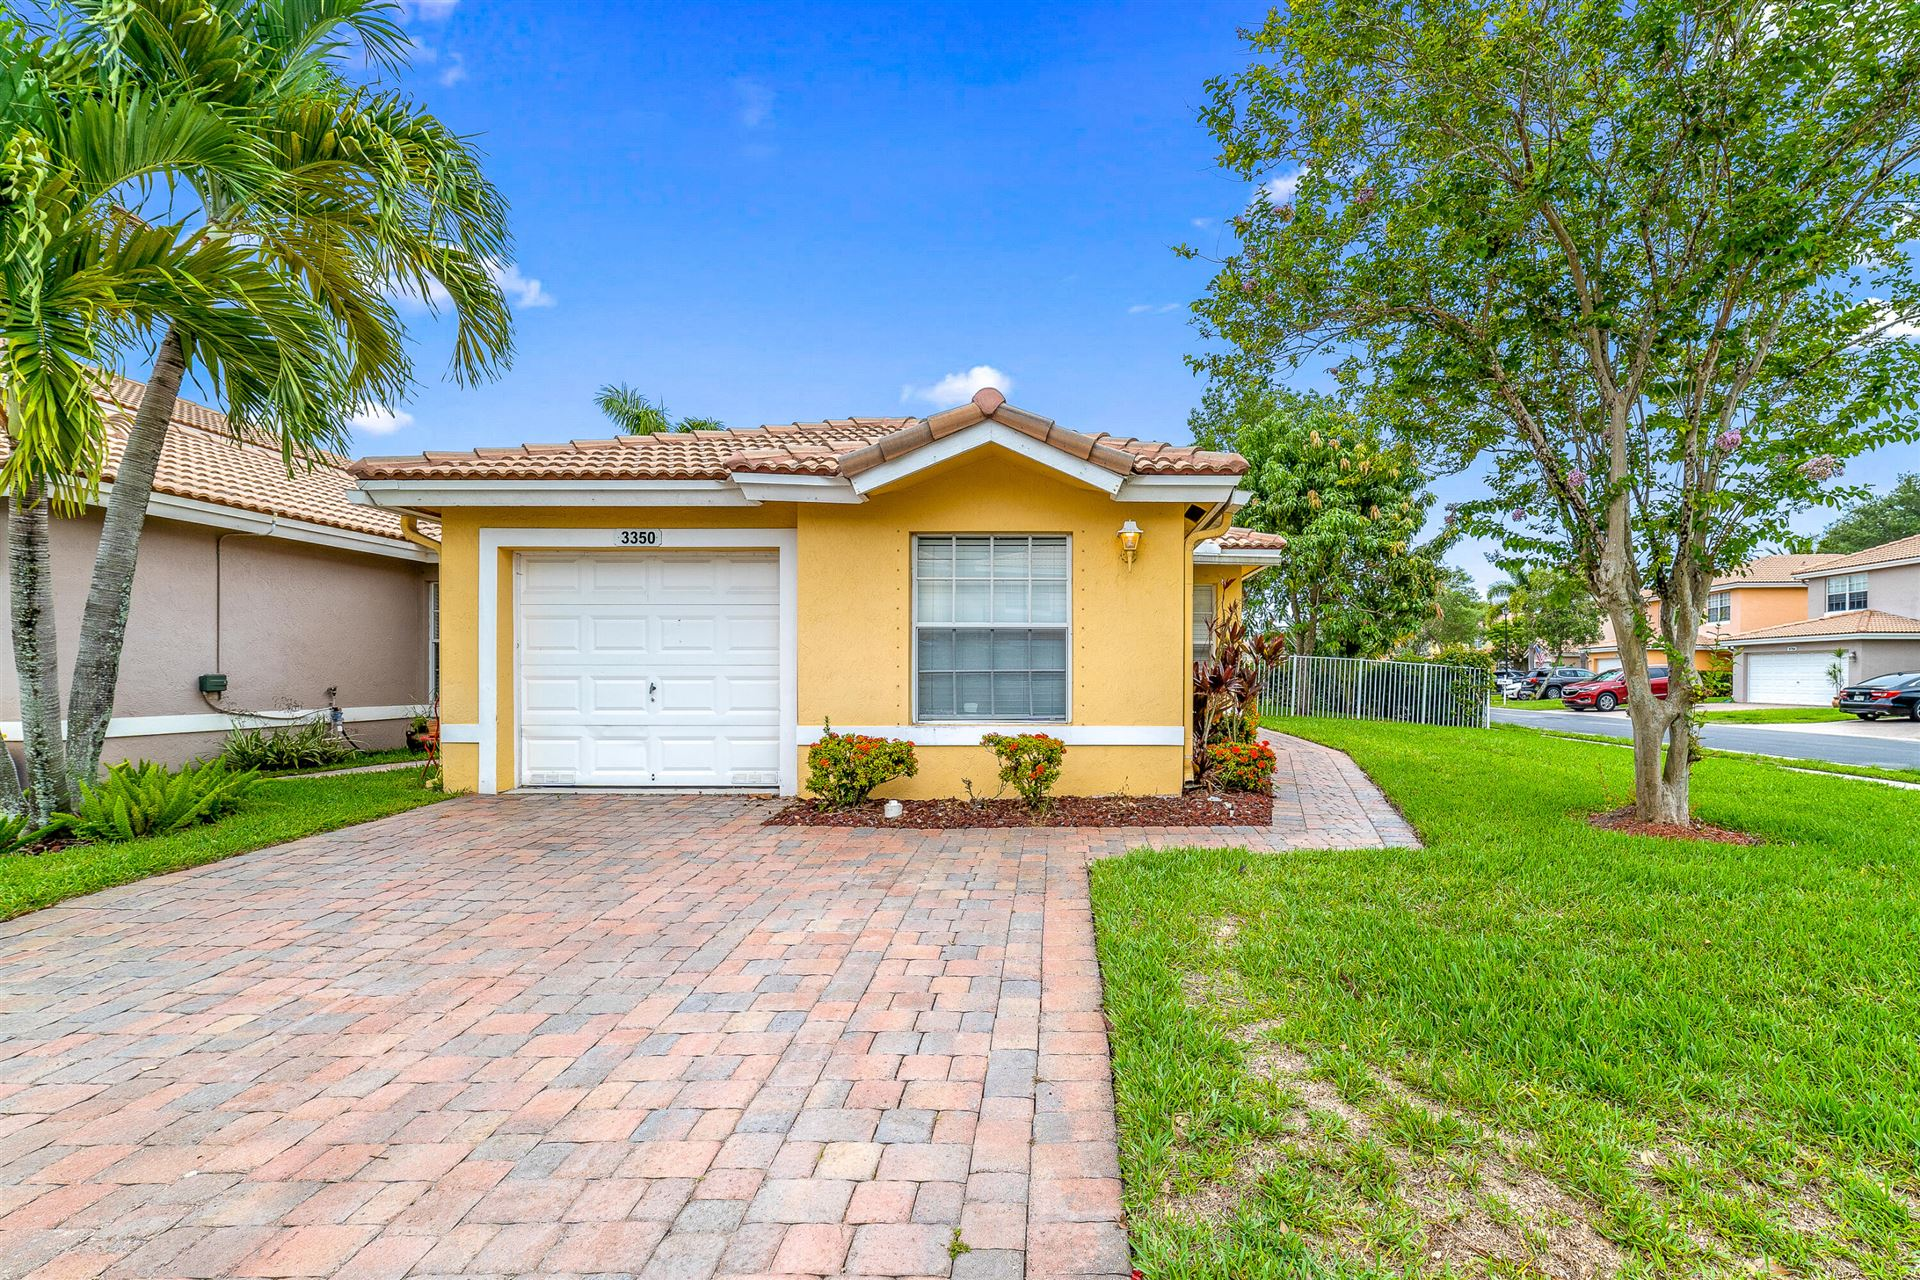 3350 Commodore Court, West Palm Beach, FL 33411 - MLS#: RX-10725361